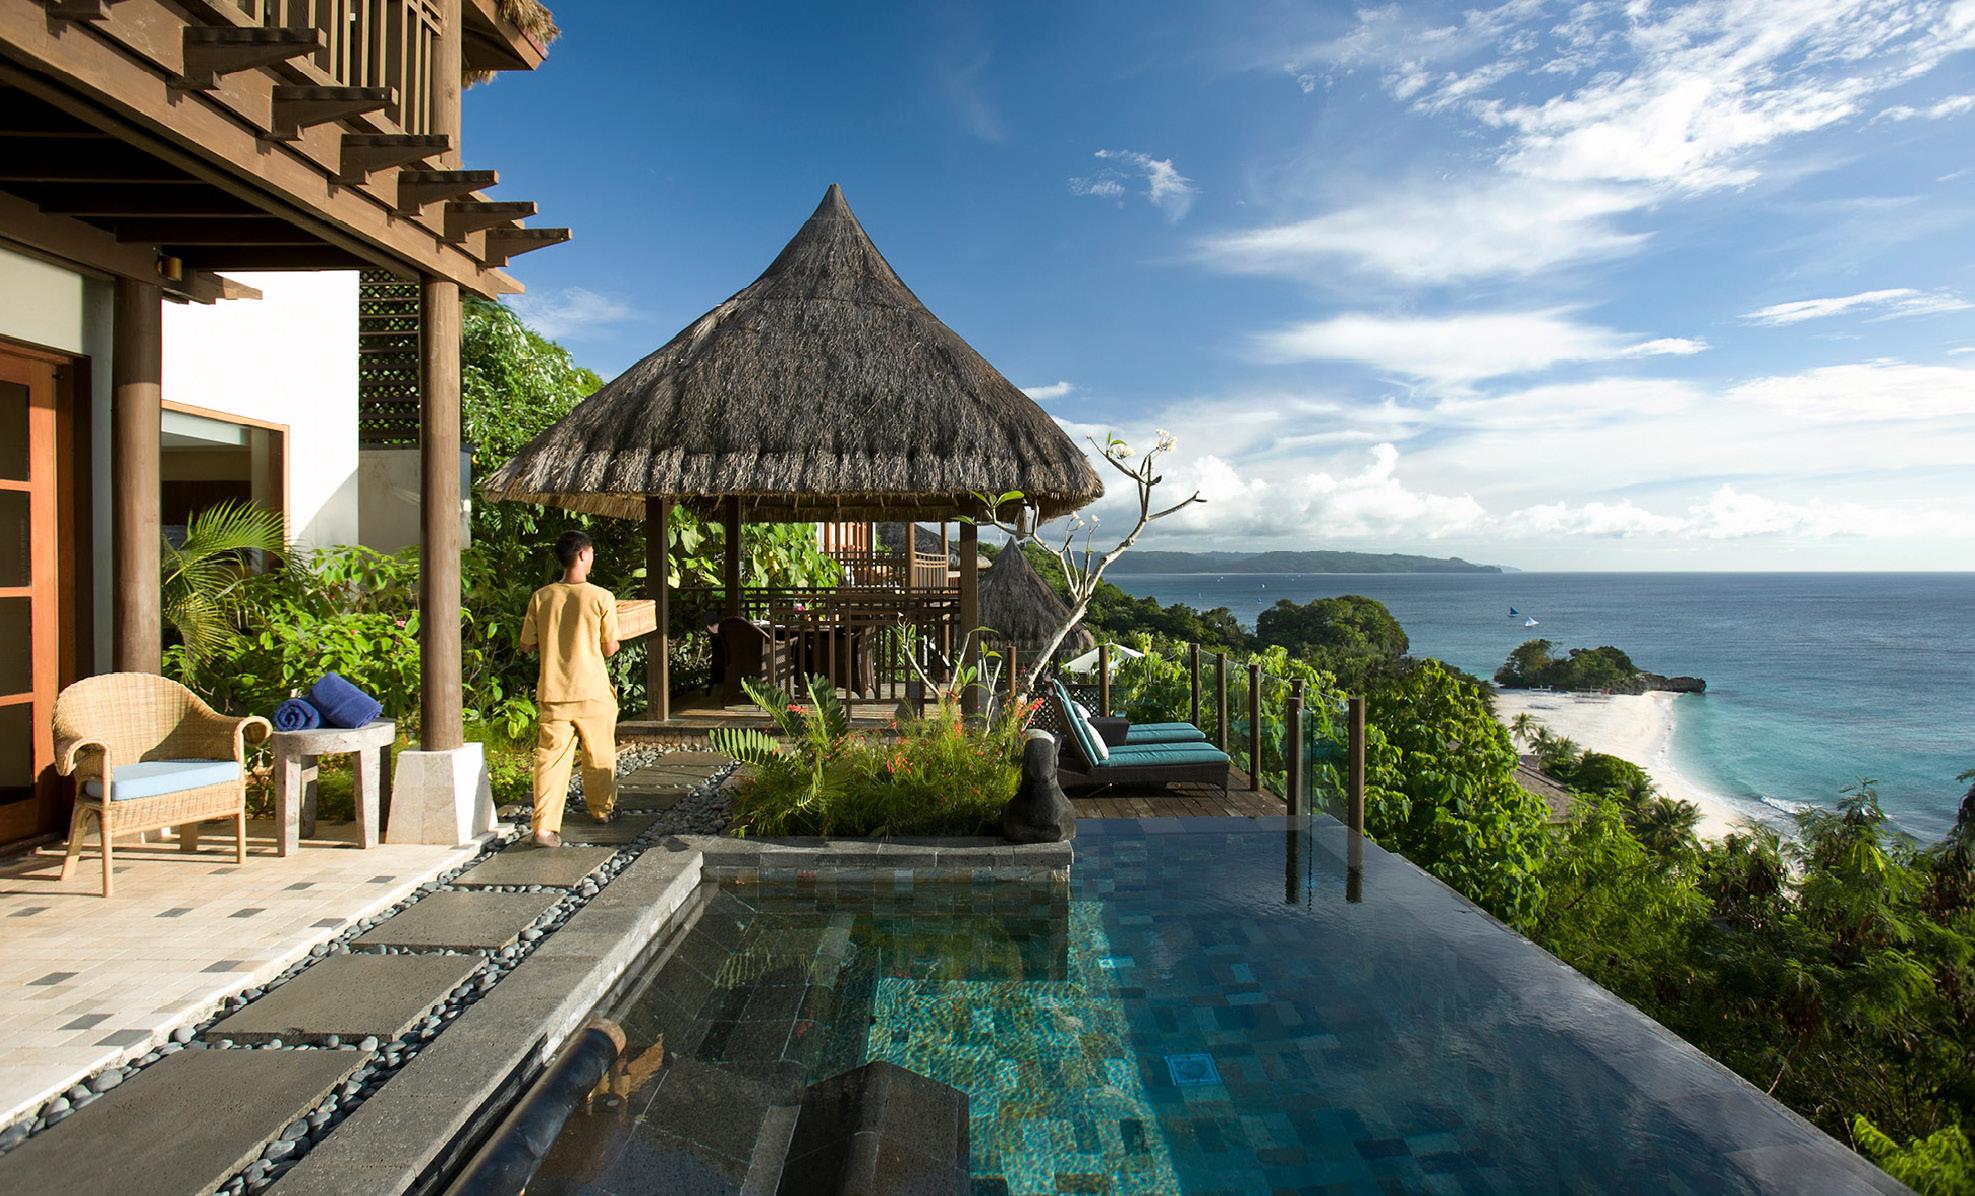 asia pool villa philippines shangrilla boracay